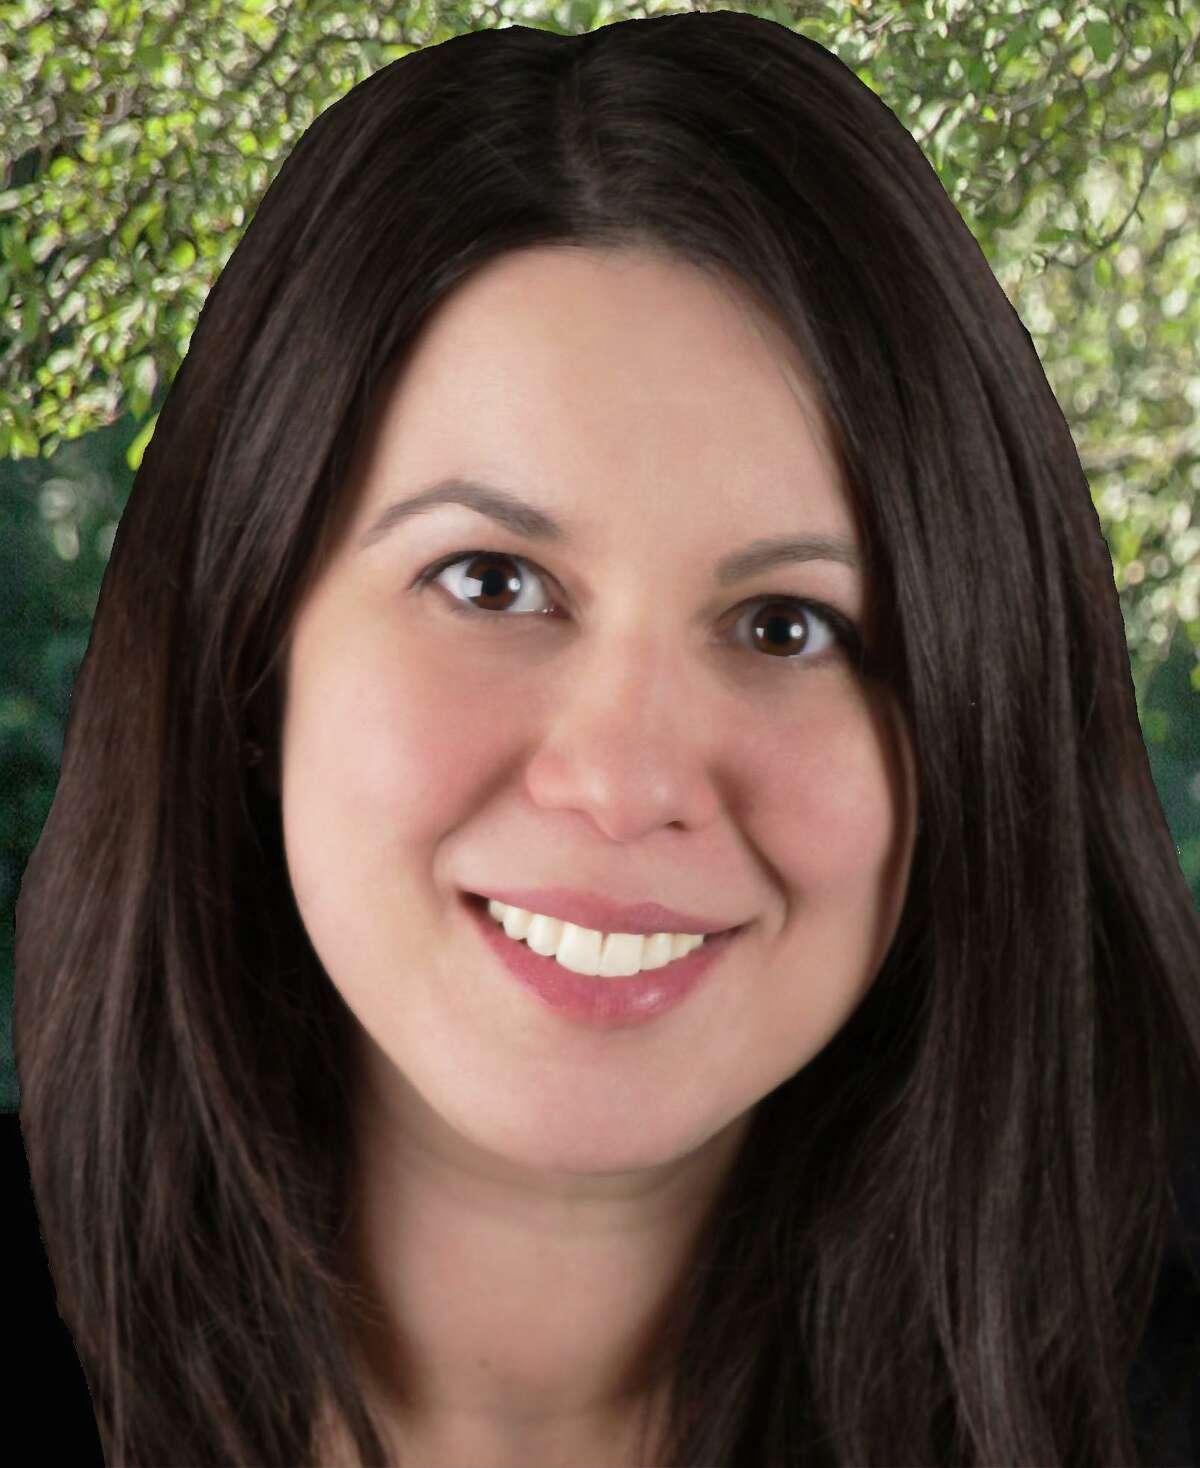 Melissa-Jean Rotini Cole's Newborn Session